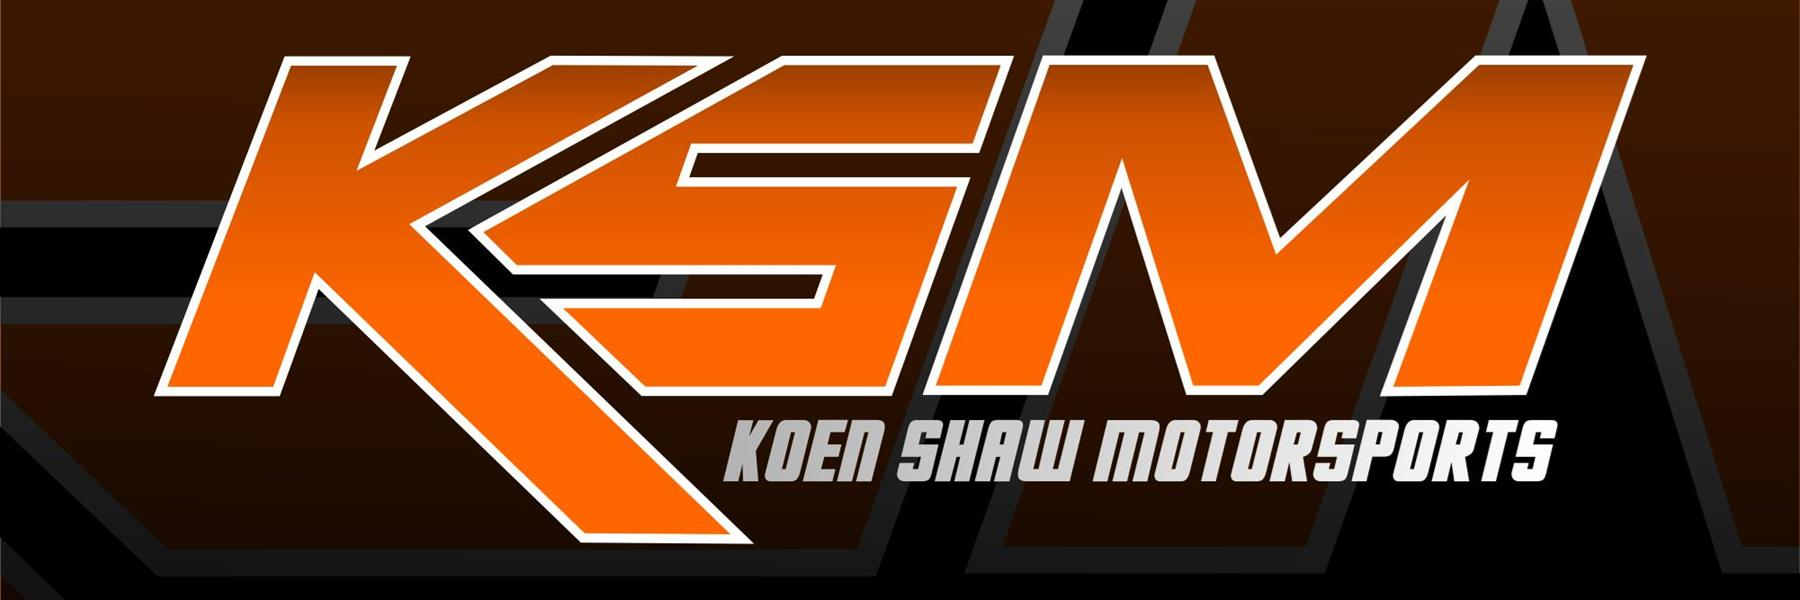 Koen Shaw